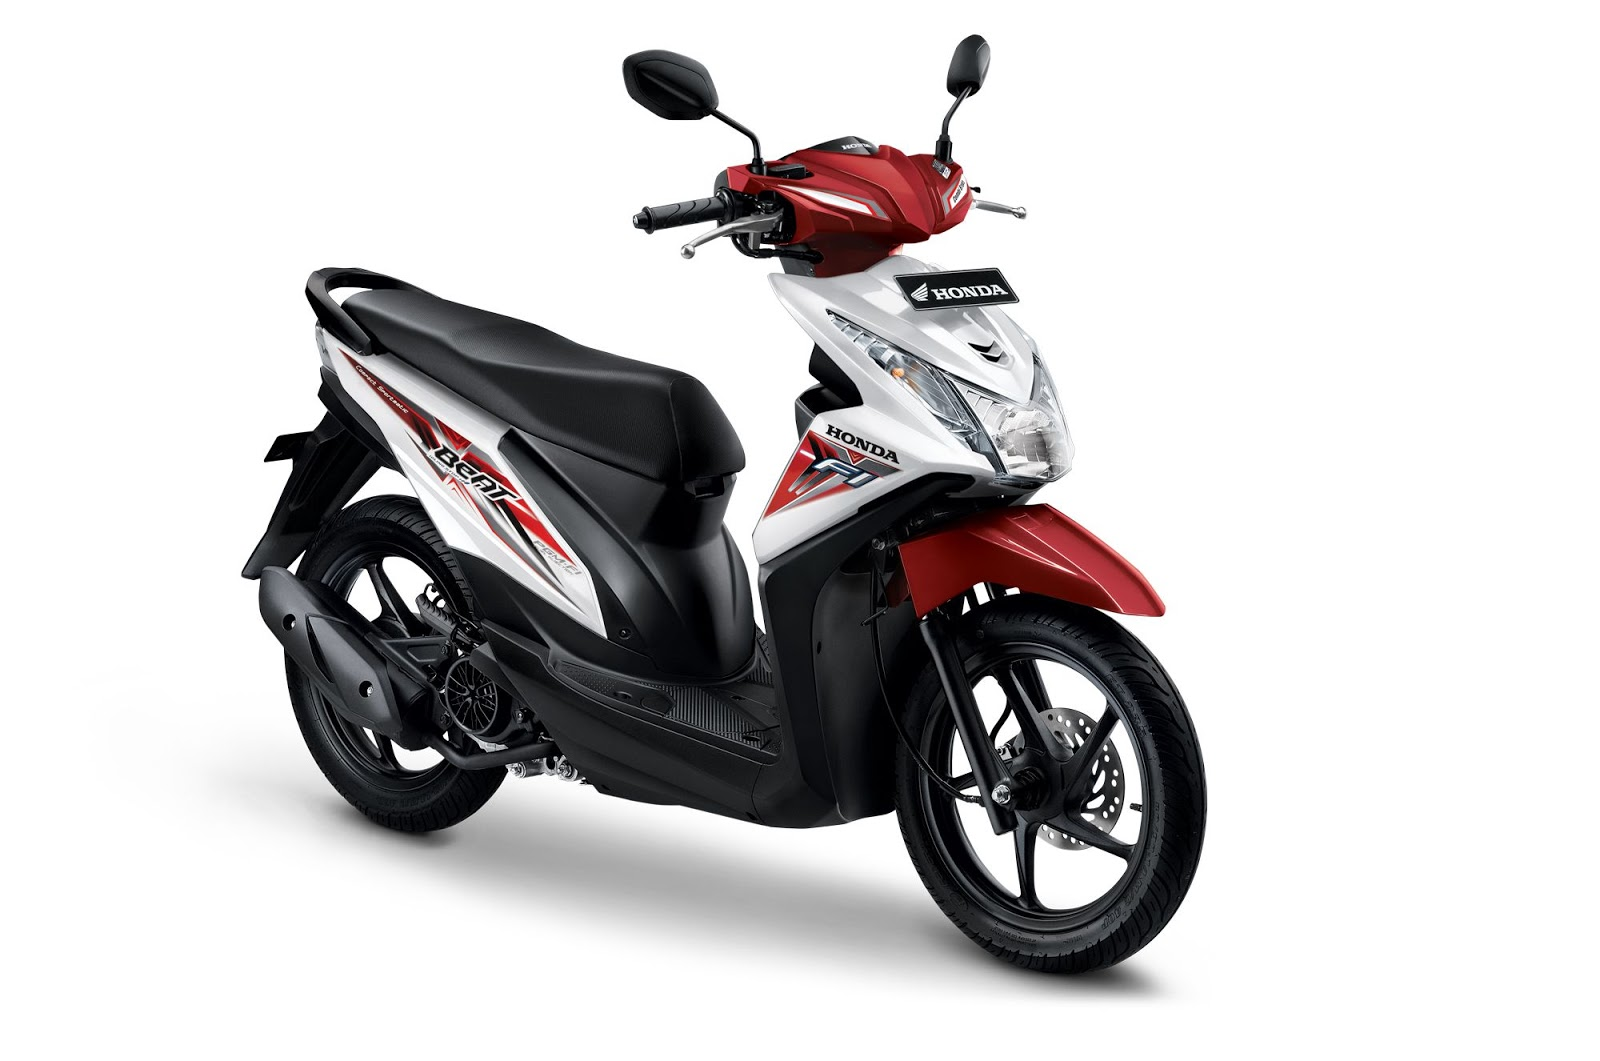 Harga Motor Honda Beat eSP dan Spesifikasi Terbaru 2018